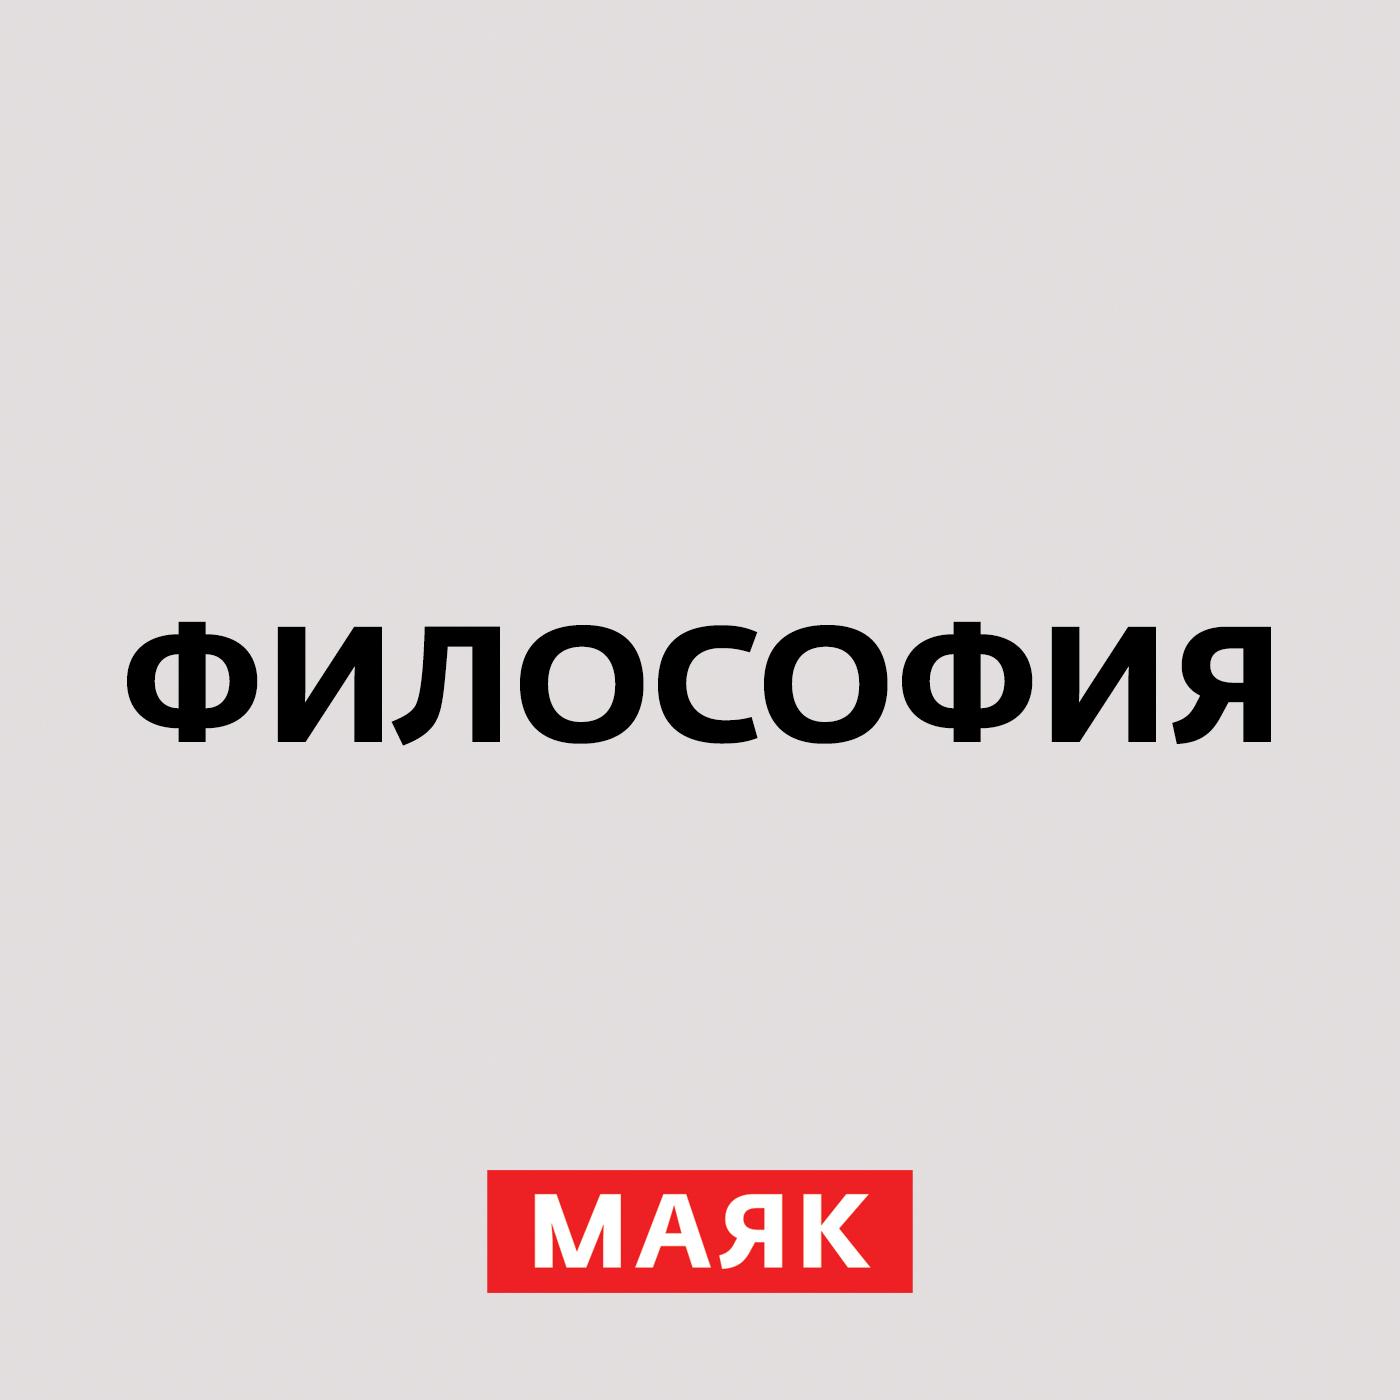 Творческий коллектив шоу «Объект 22» Схоластика творческий коллектив шоу объект 22 лео штраус и эзотеризм